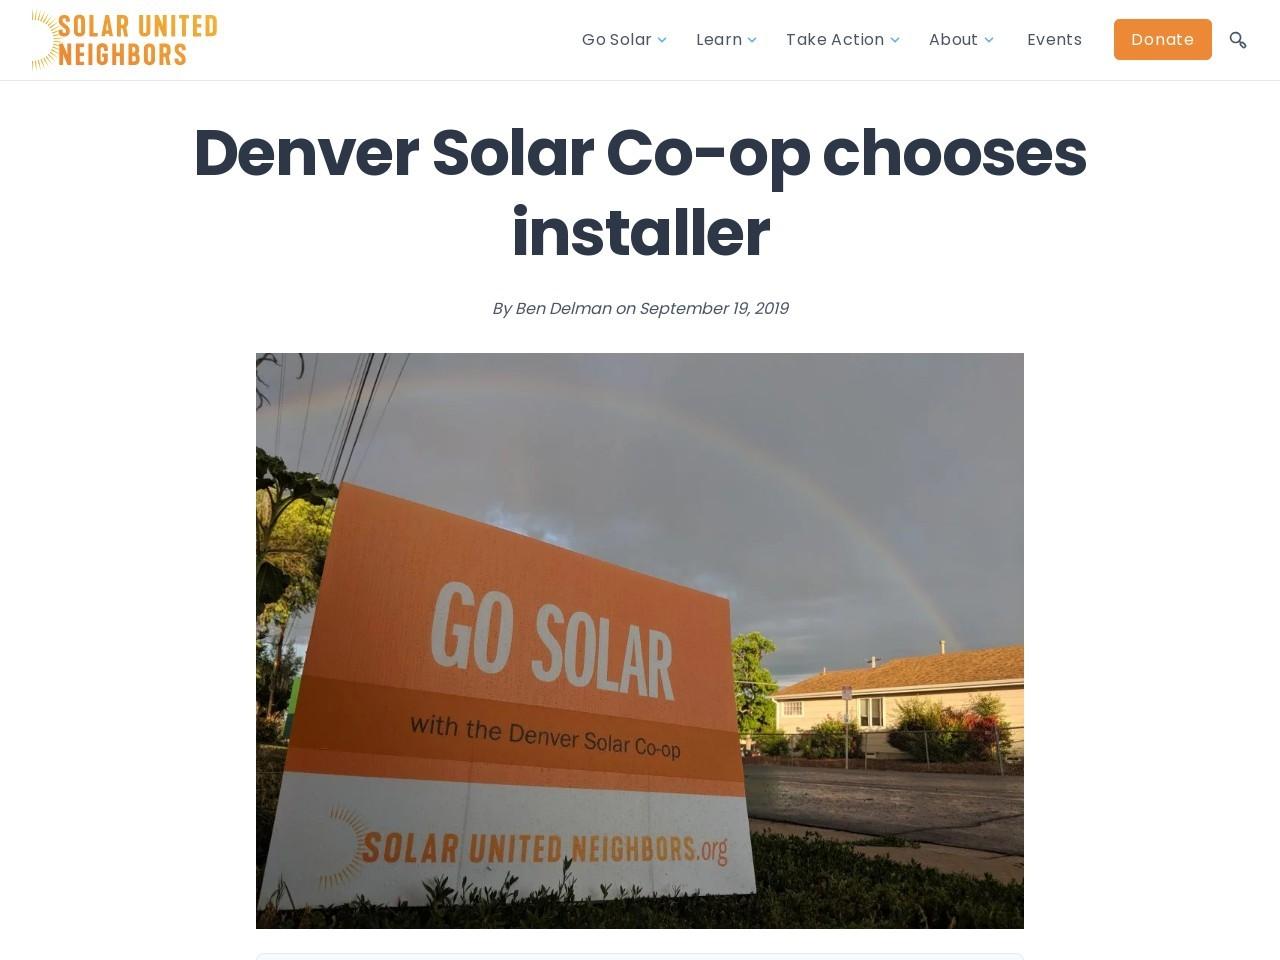 Denver Solar Co-op chooses installer